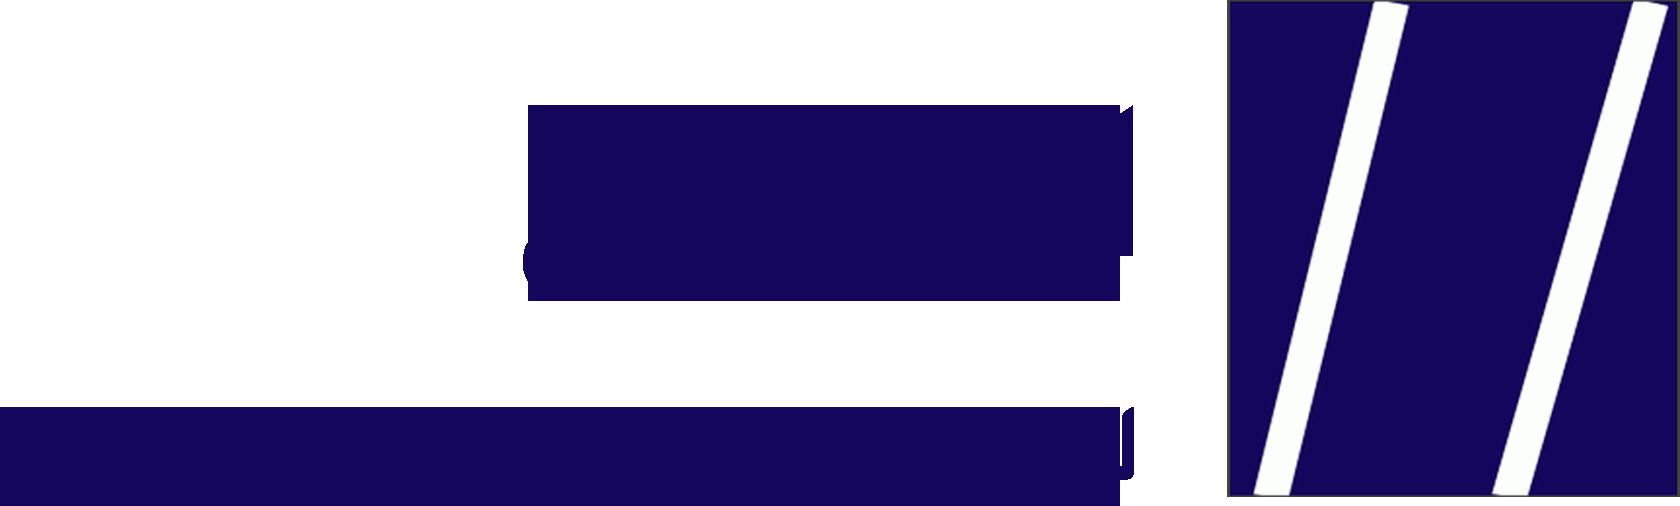 AlZaman Law Firm - ZAMAN LEGAL SERVICES & ATTORNEYS